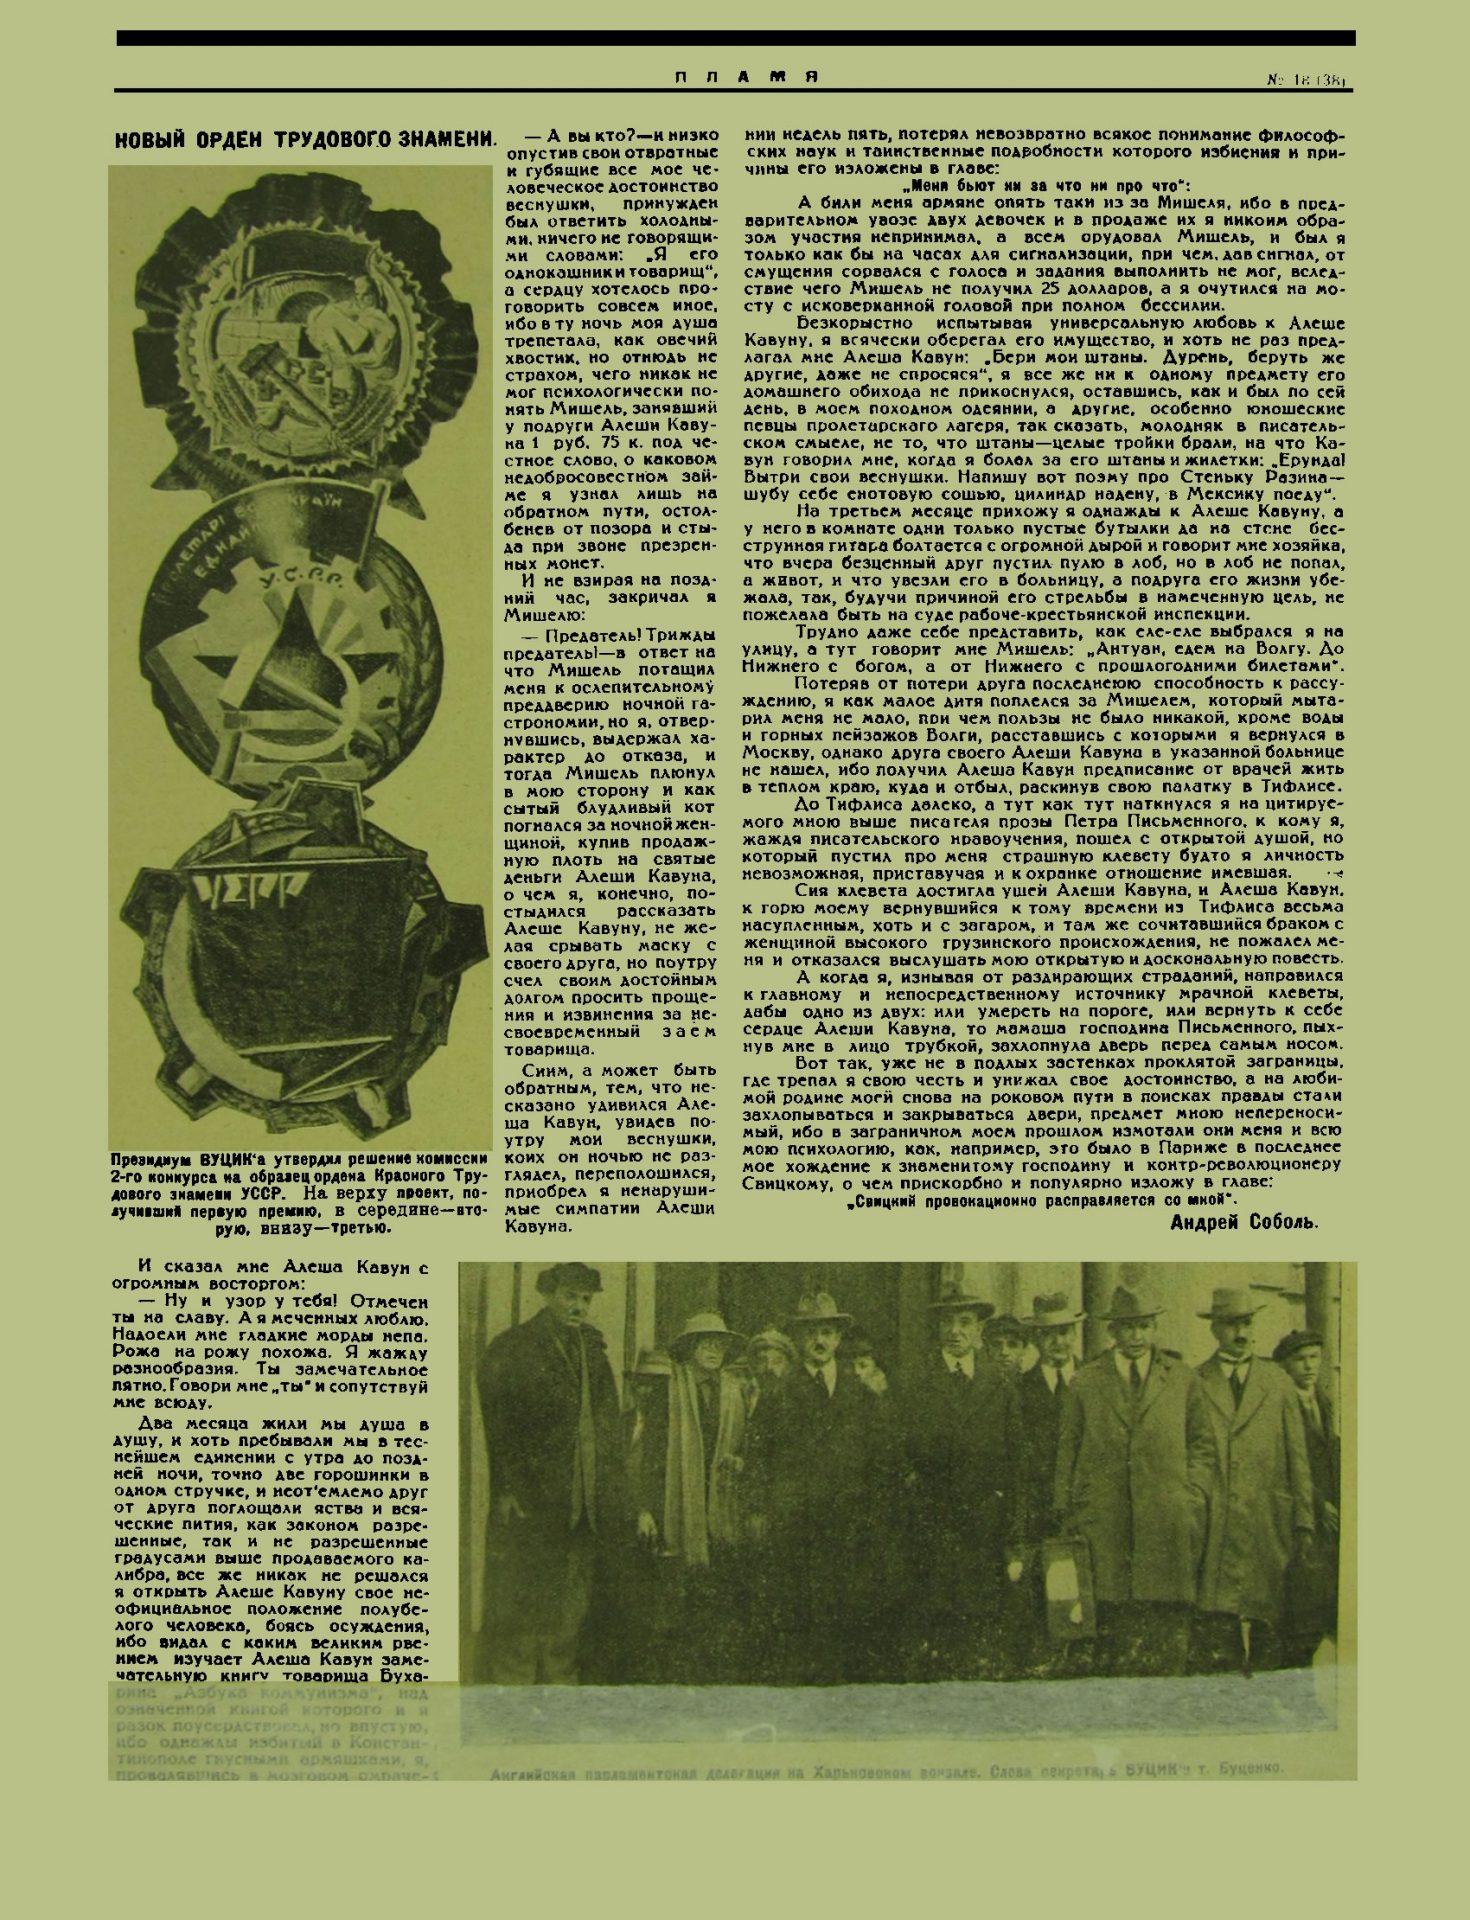 Пламя_1925_№18